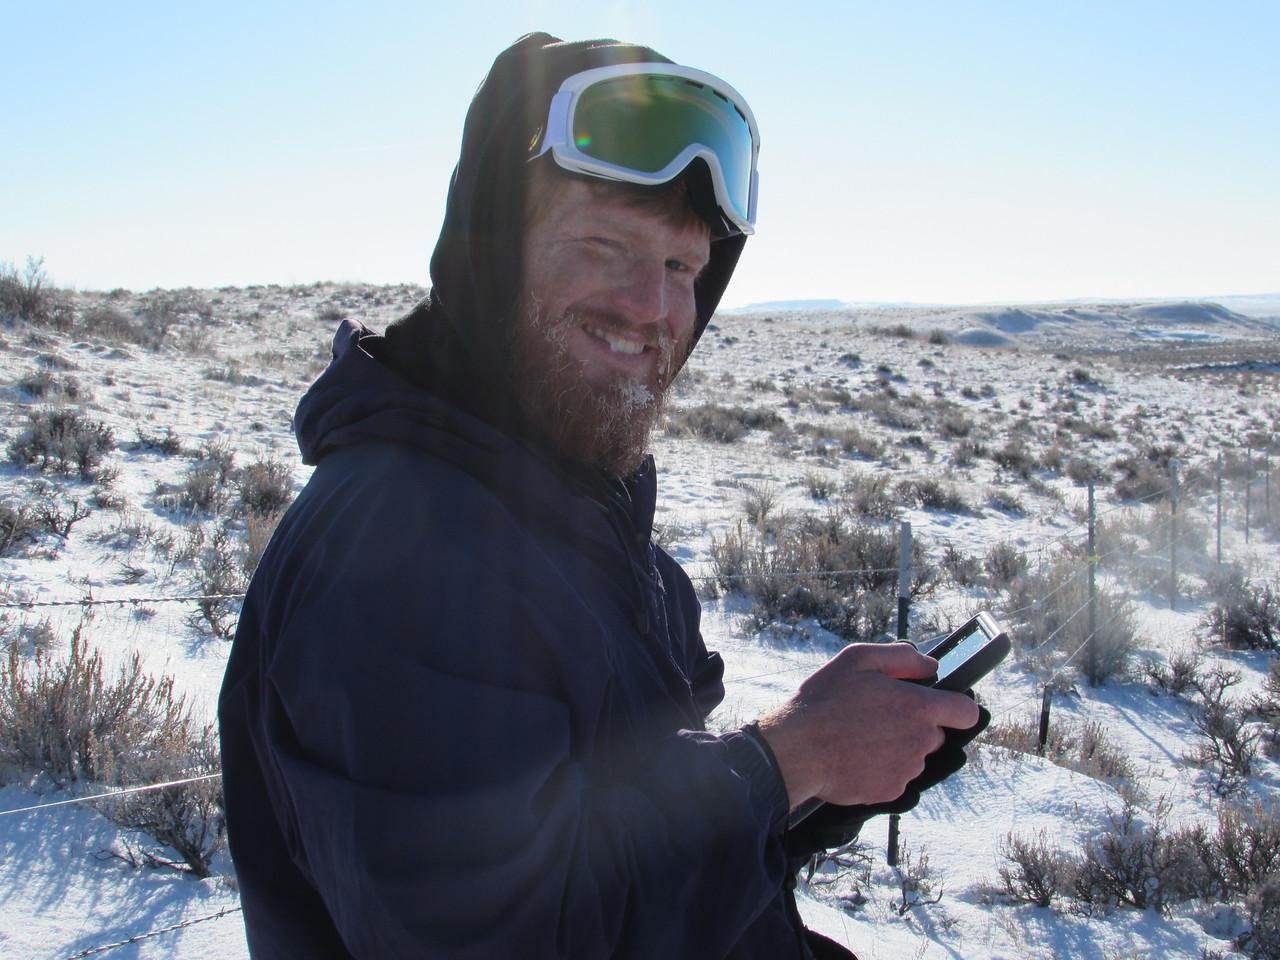 Zach McKeown using a Google Nexus Tablet for Landmark at APR